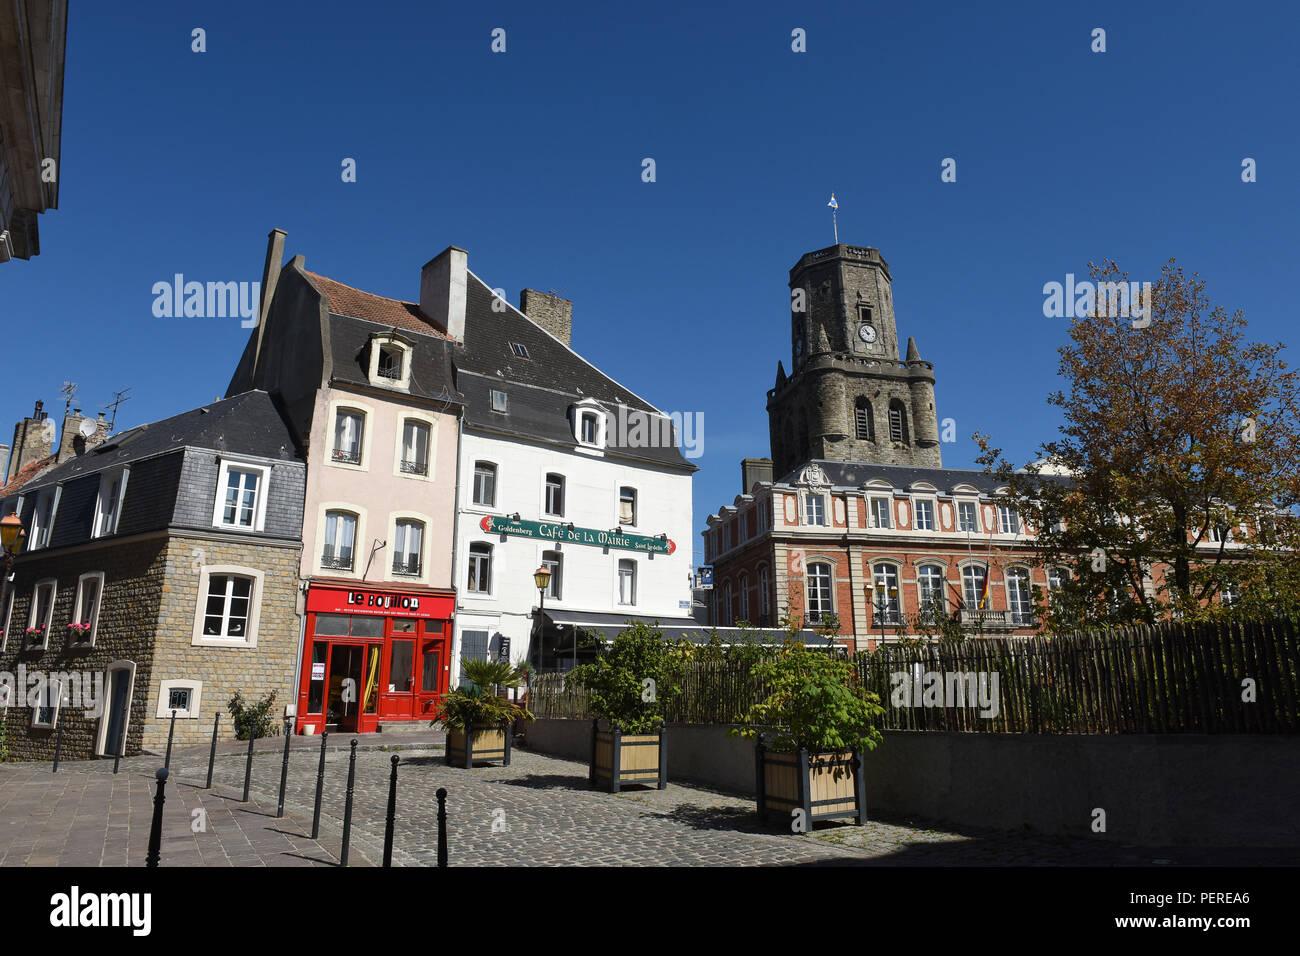 Boulogne-sur-Mer in northern France 2018 - Stock Image